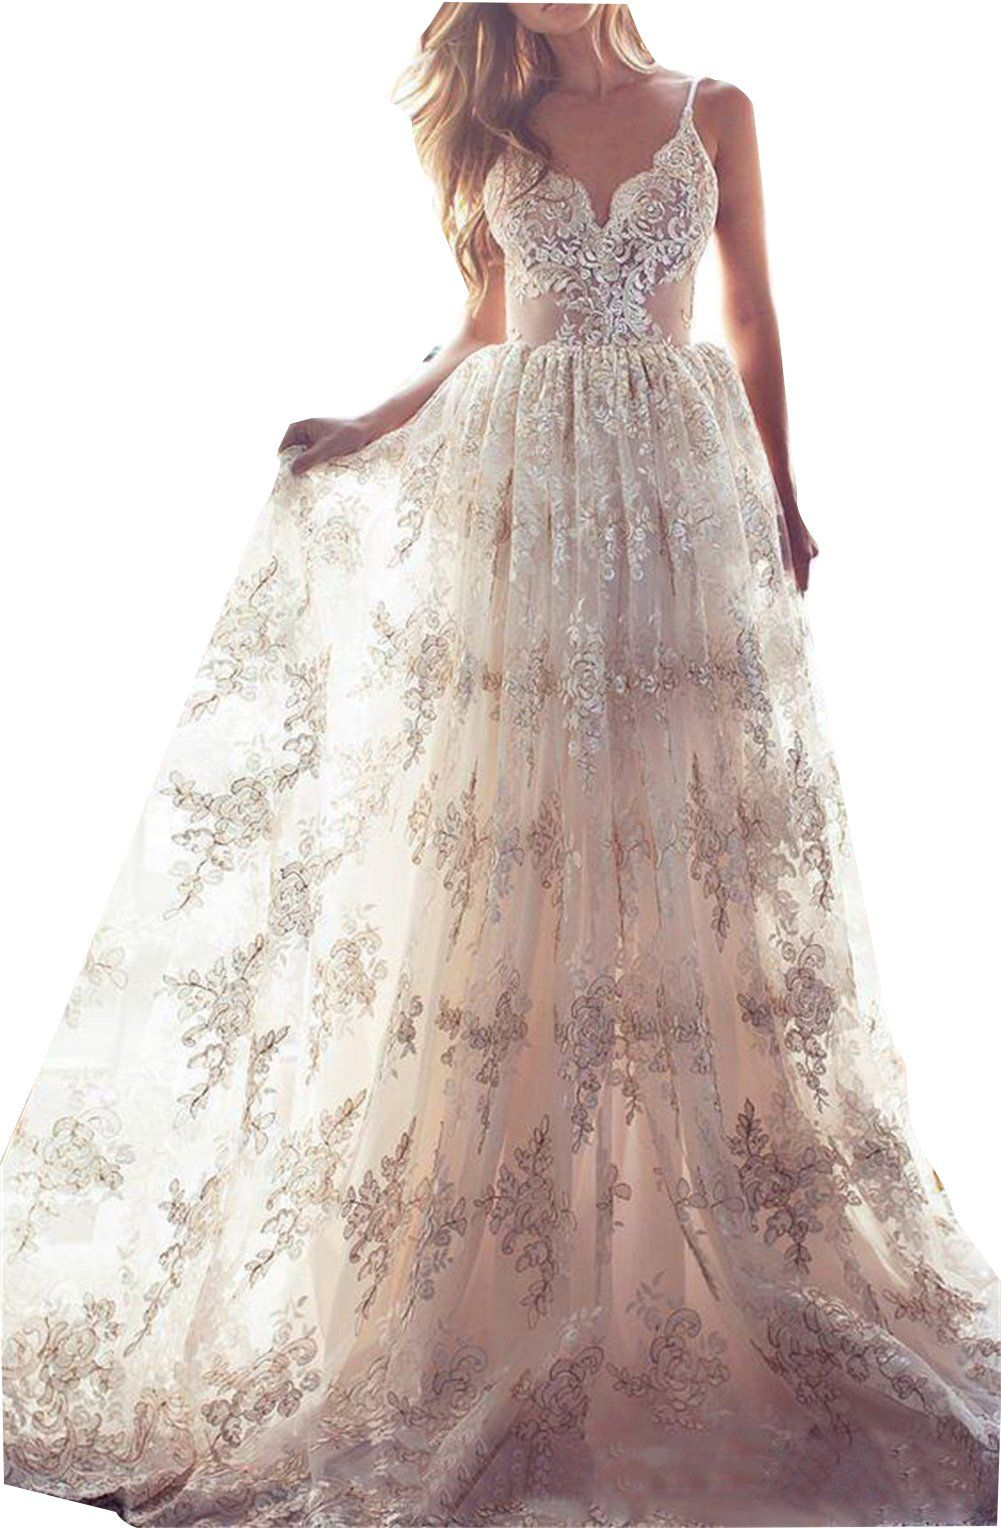 478be431d1 Ellystar Womens New ALine Lace Sleeveless Backless V Neck Wedding Dresses  Champagne US8   More info